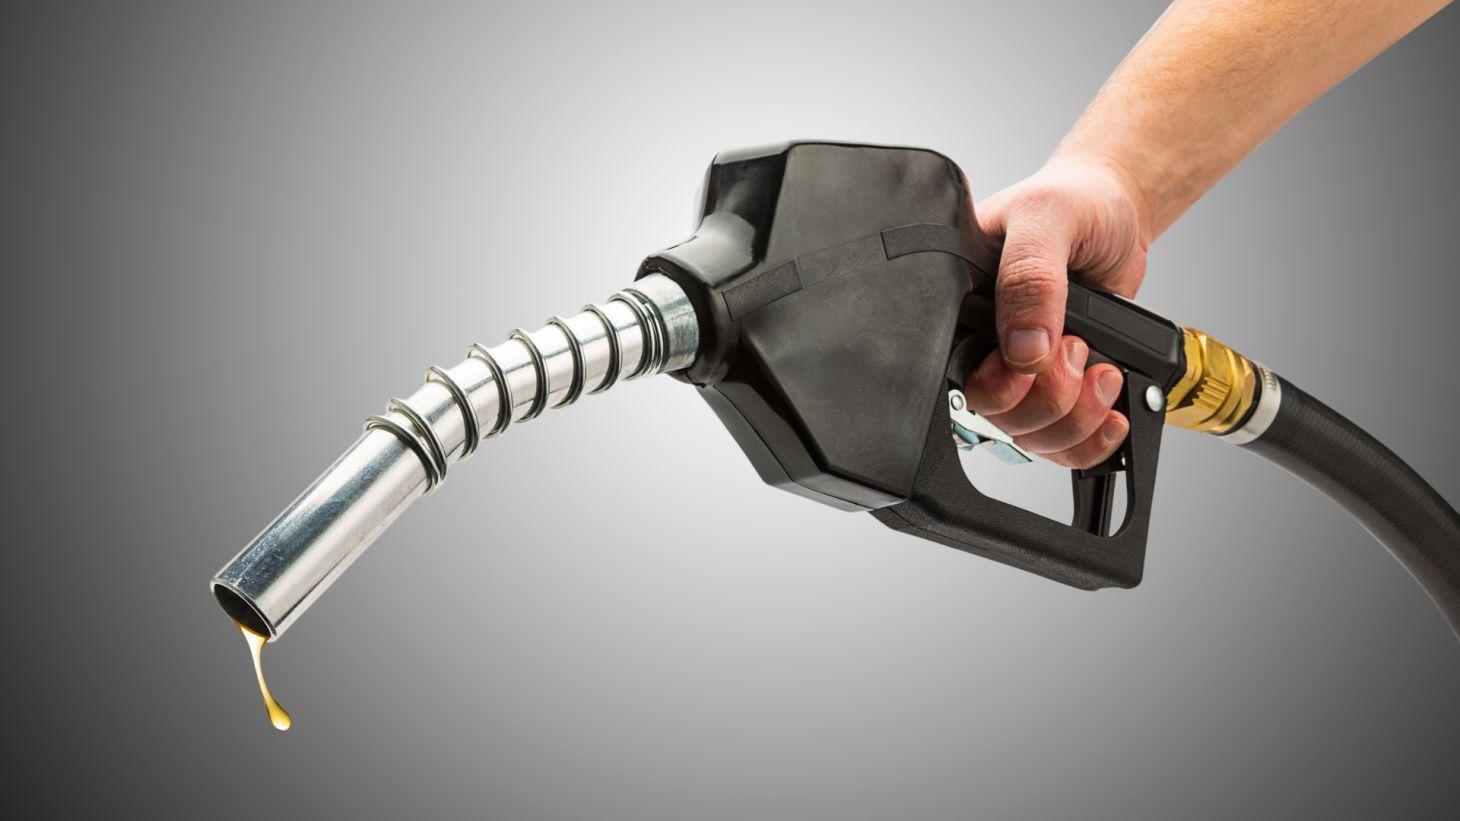 mangueira bomba conbustivel abastecer posto etanol anidro hidratado alcool gasolina